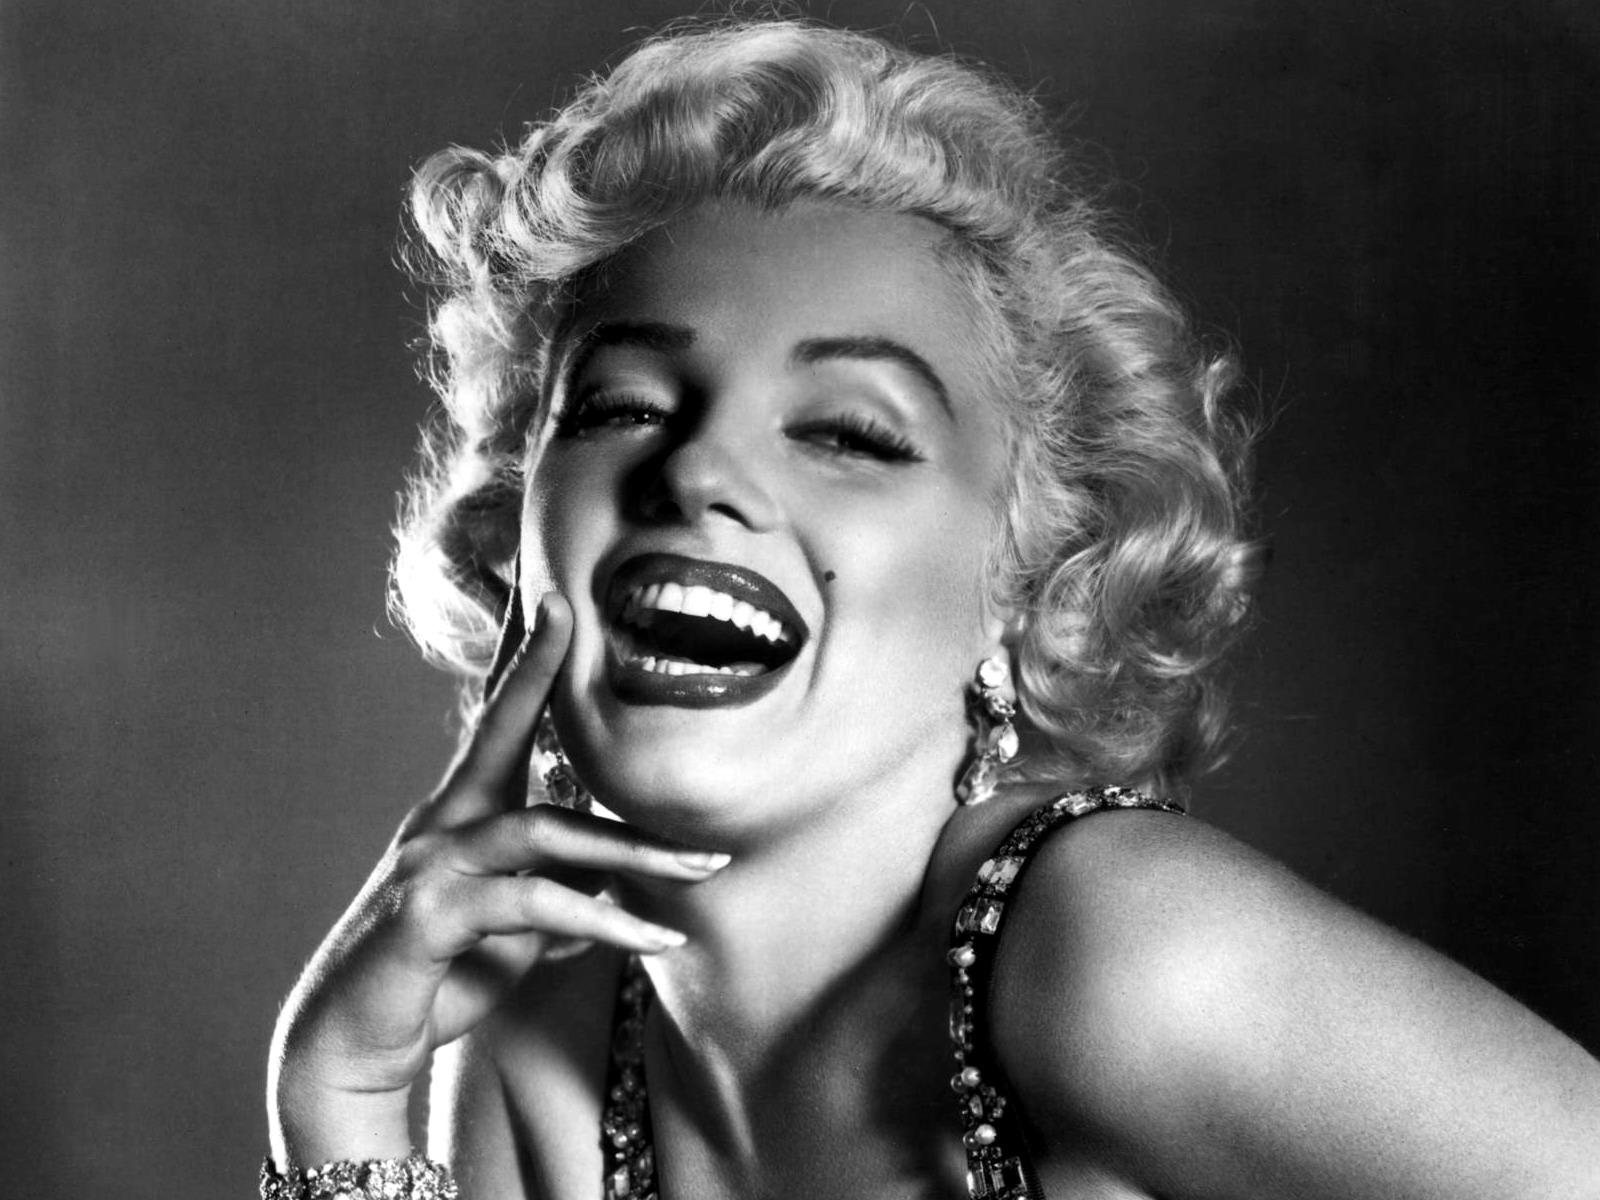 http://4.bp.blogspot.com/-HdnIZekkxrM/UAaebdnxriI/AAAAAAAANRg/efJa9kS22Mw/s1600/Marilyn-Monroe-wallpaper_018.jpg